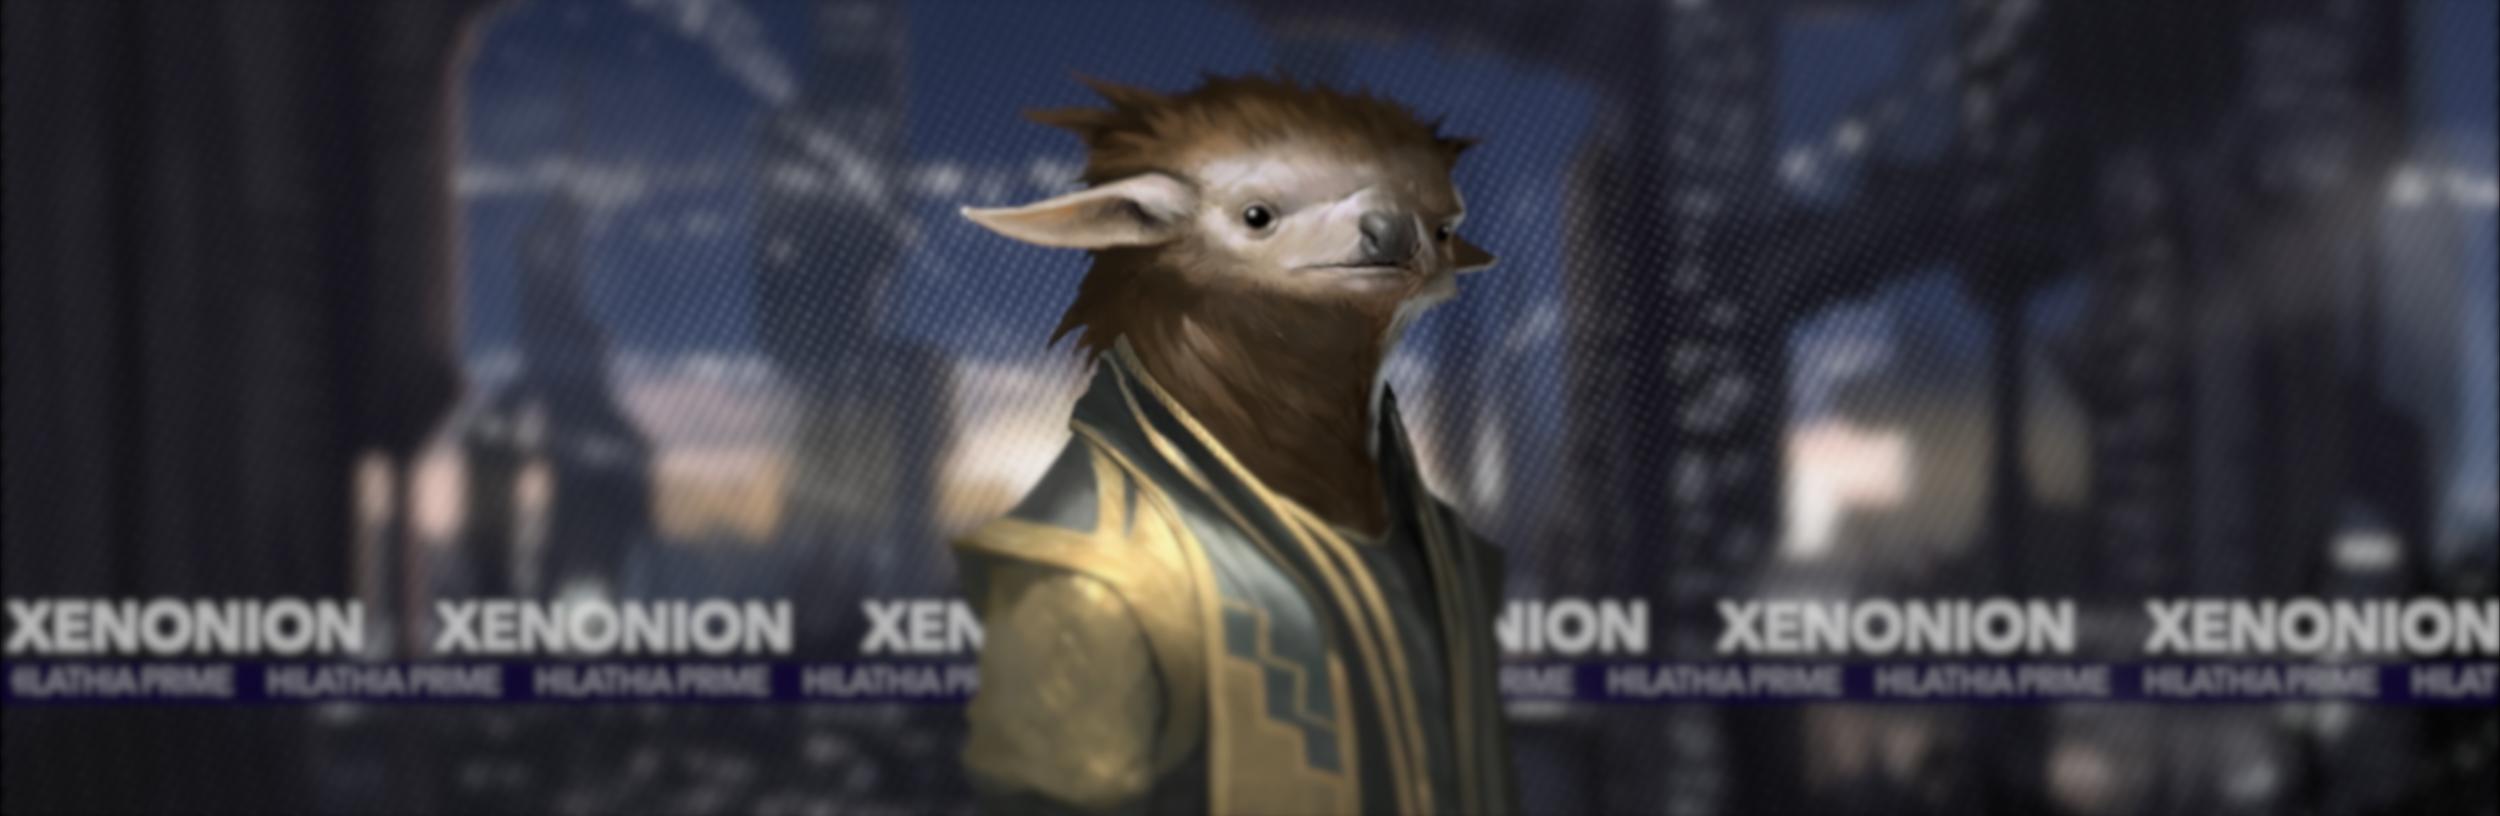 News — Xenonion News